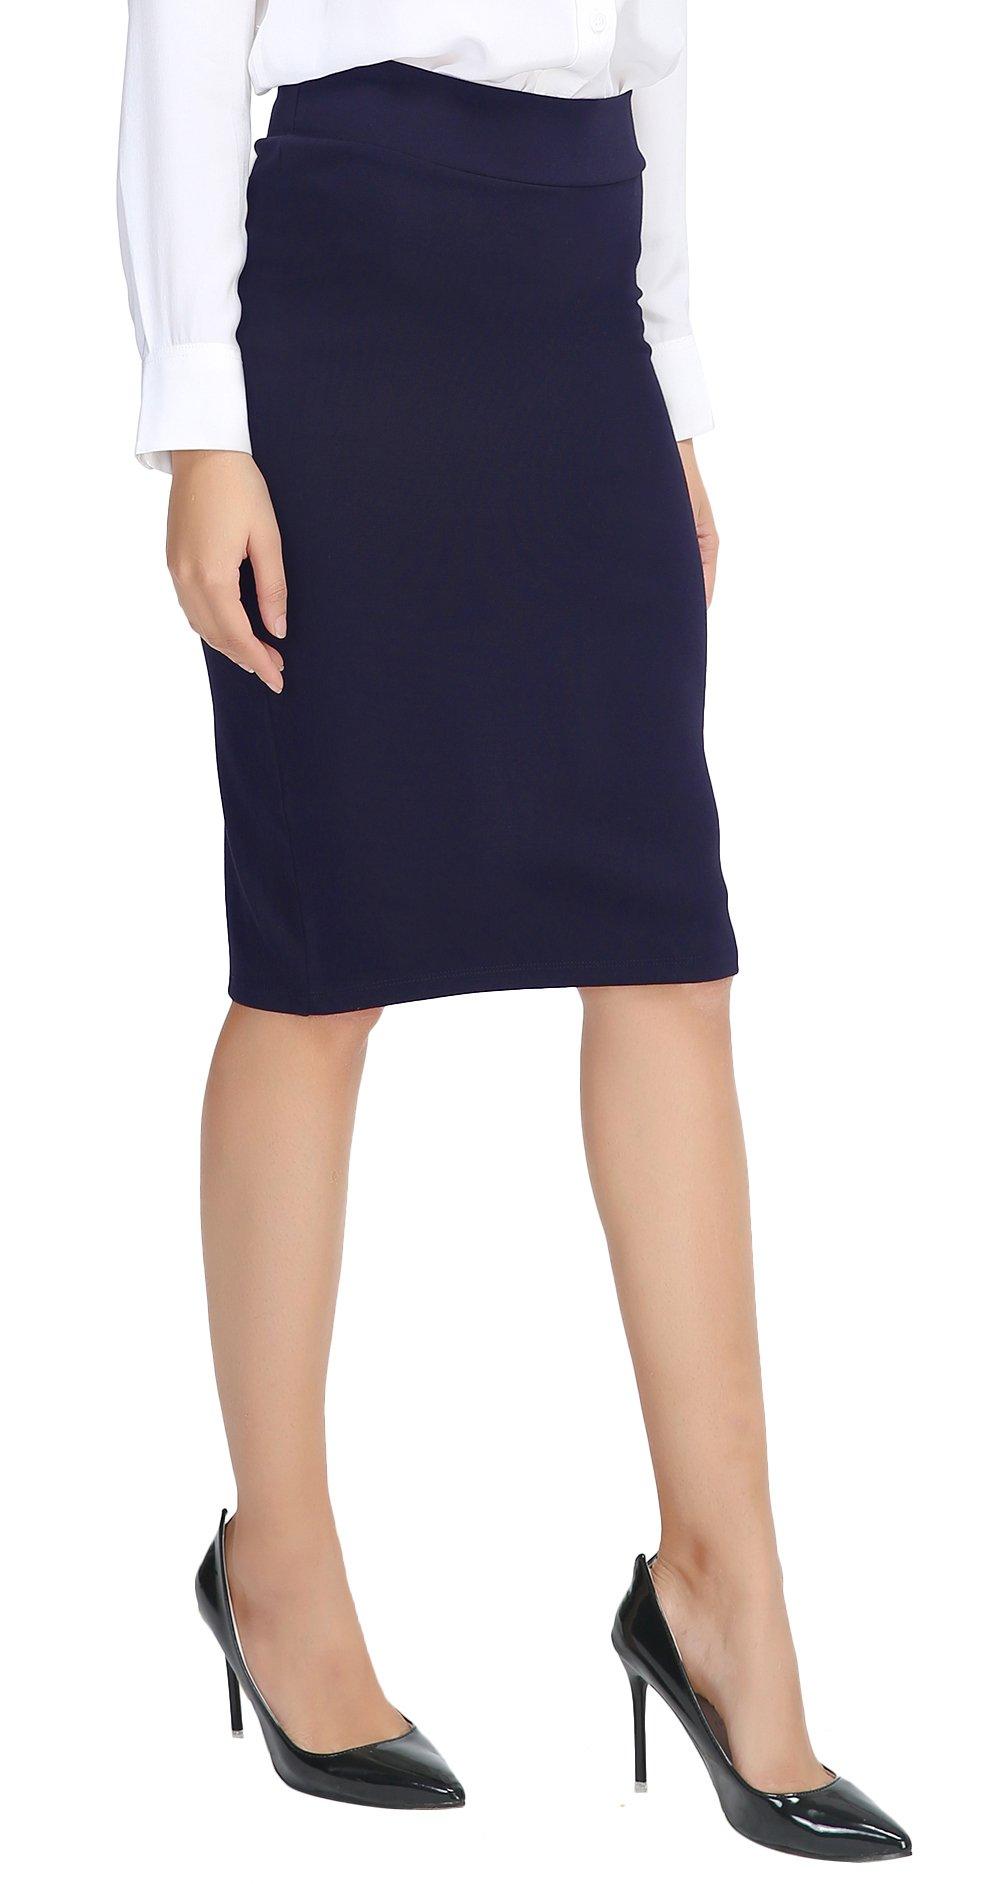 Urban CoCo Women's Elastic Waist Stretch Bodycon Midi Pencil Skirt (L, Navy Blue)